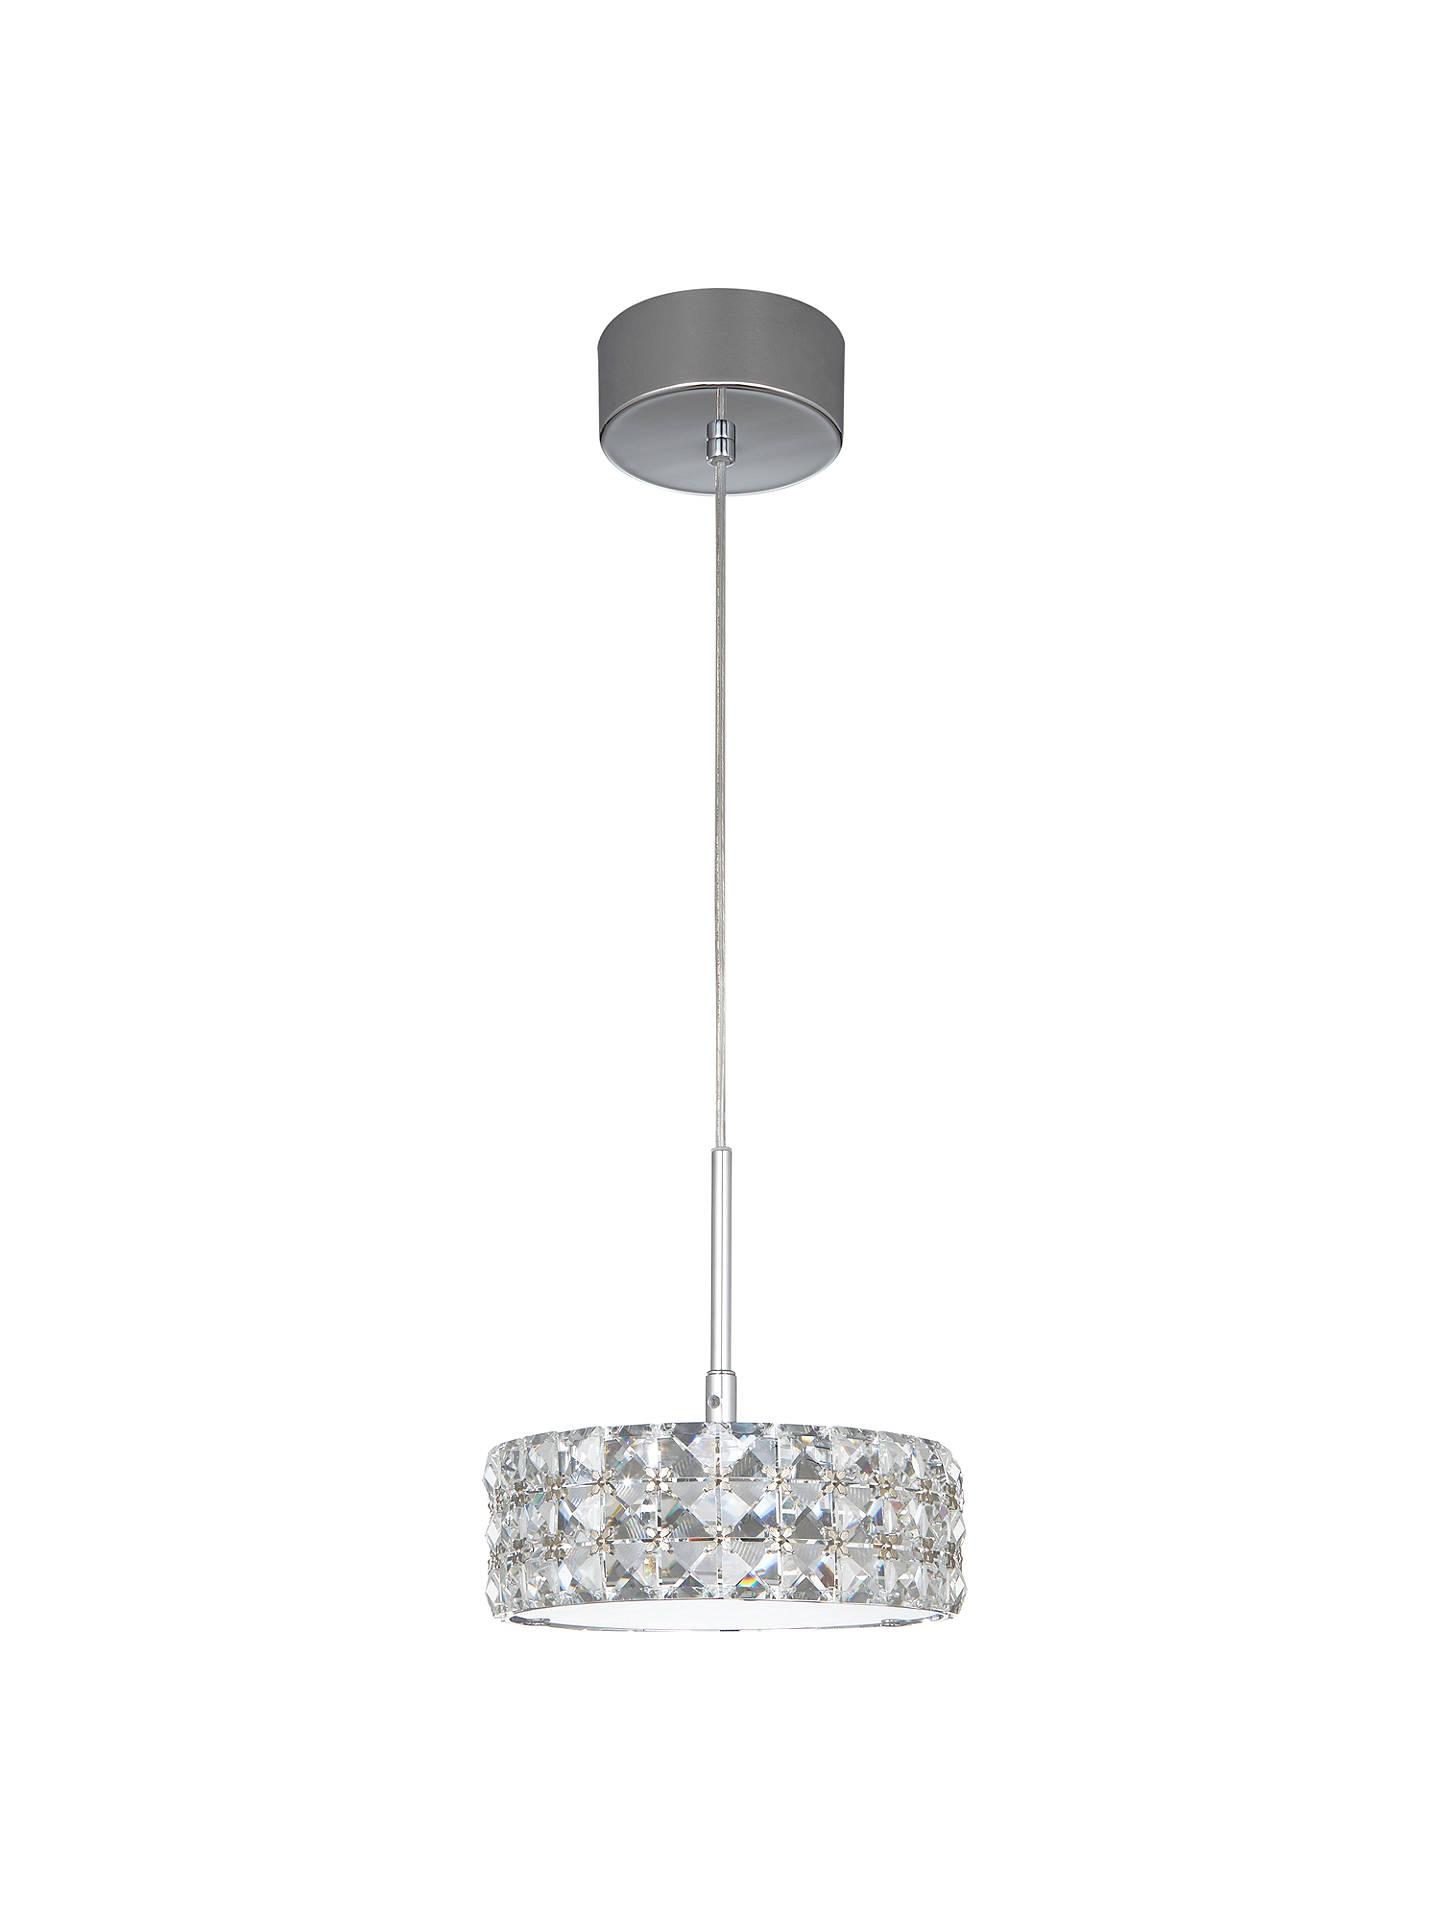 John Lewis Aurora Double Insulated Crystal Pendant Light